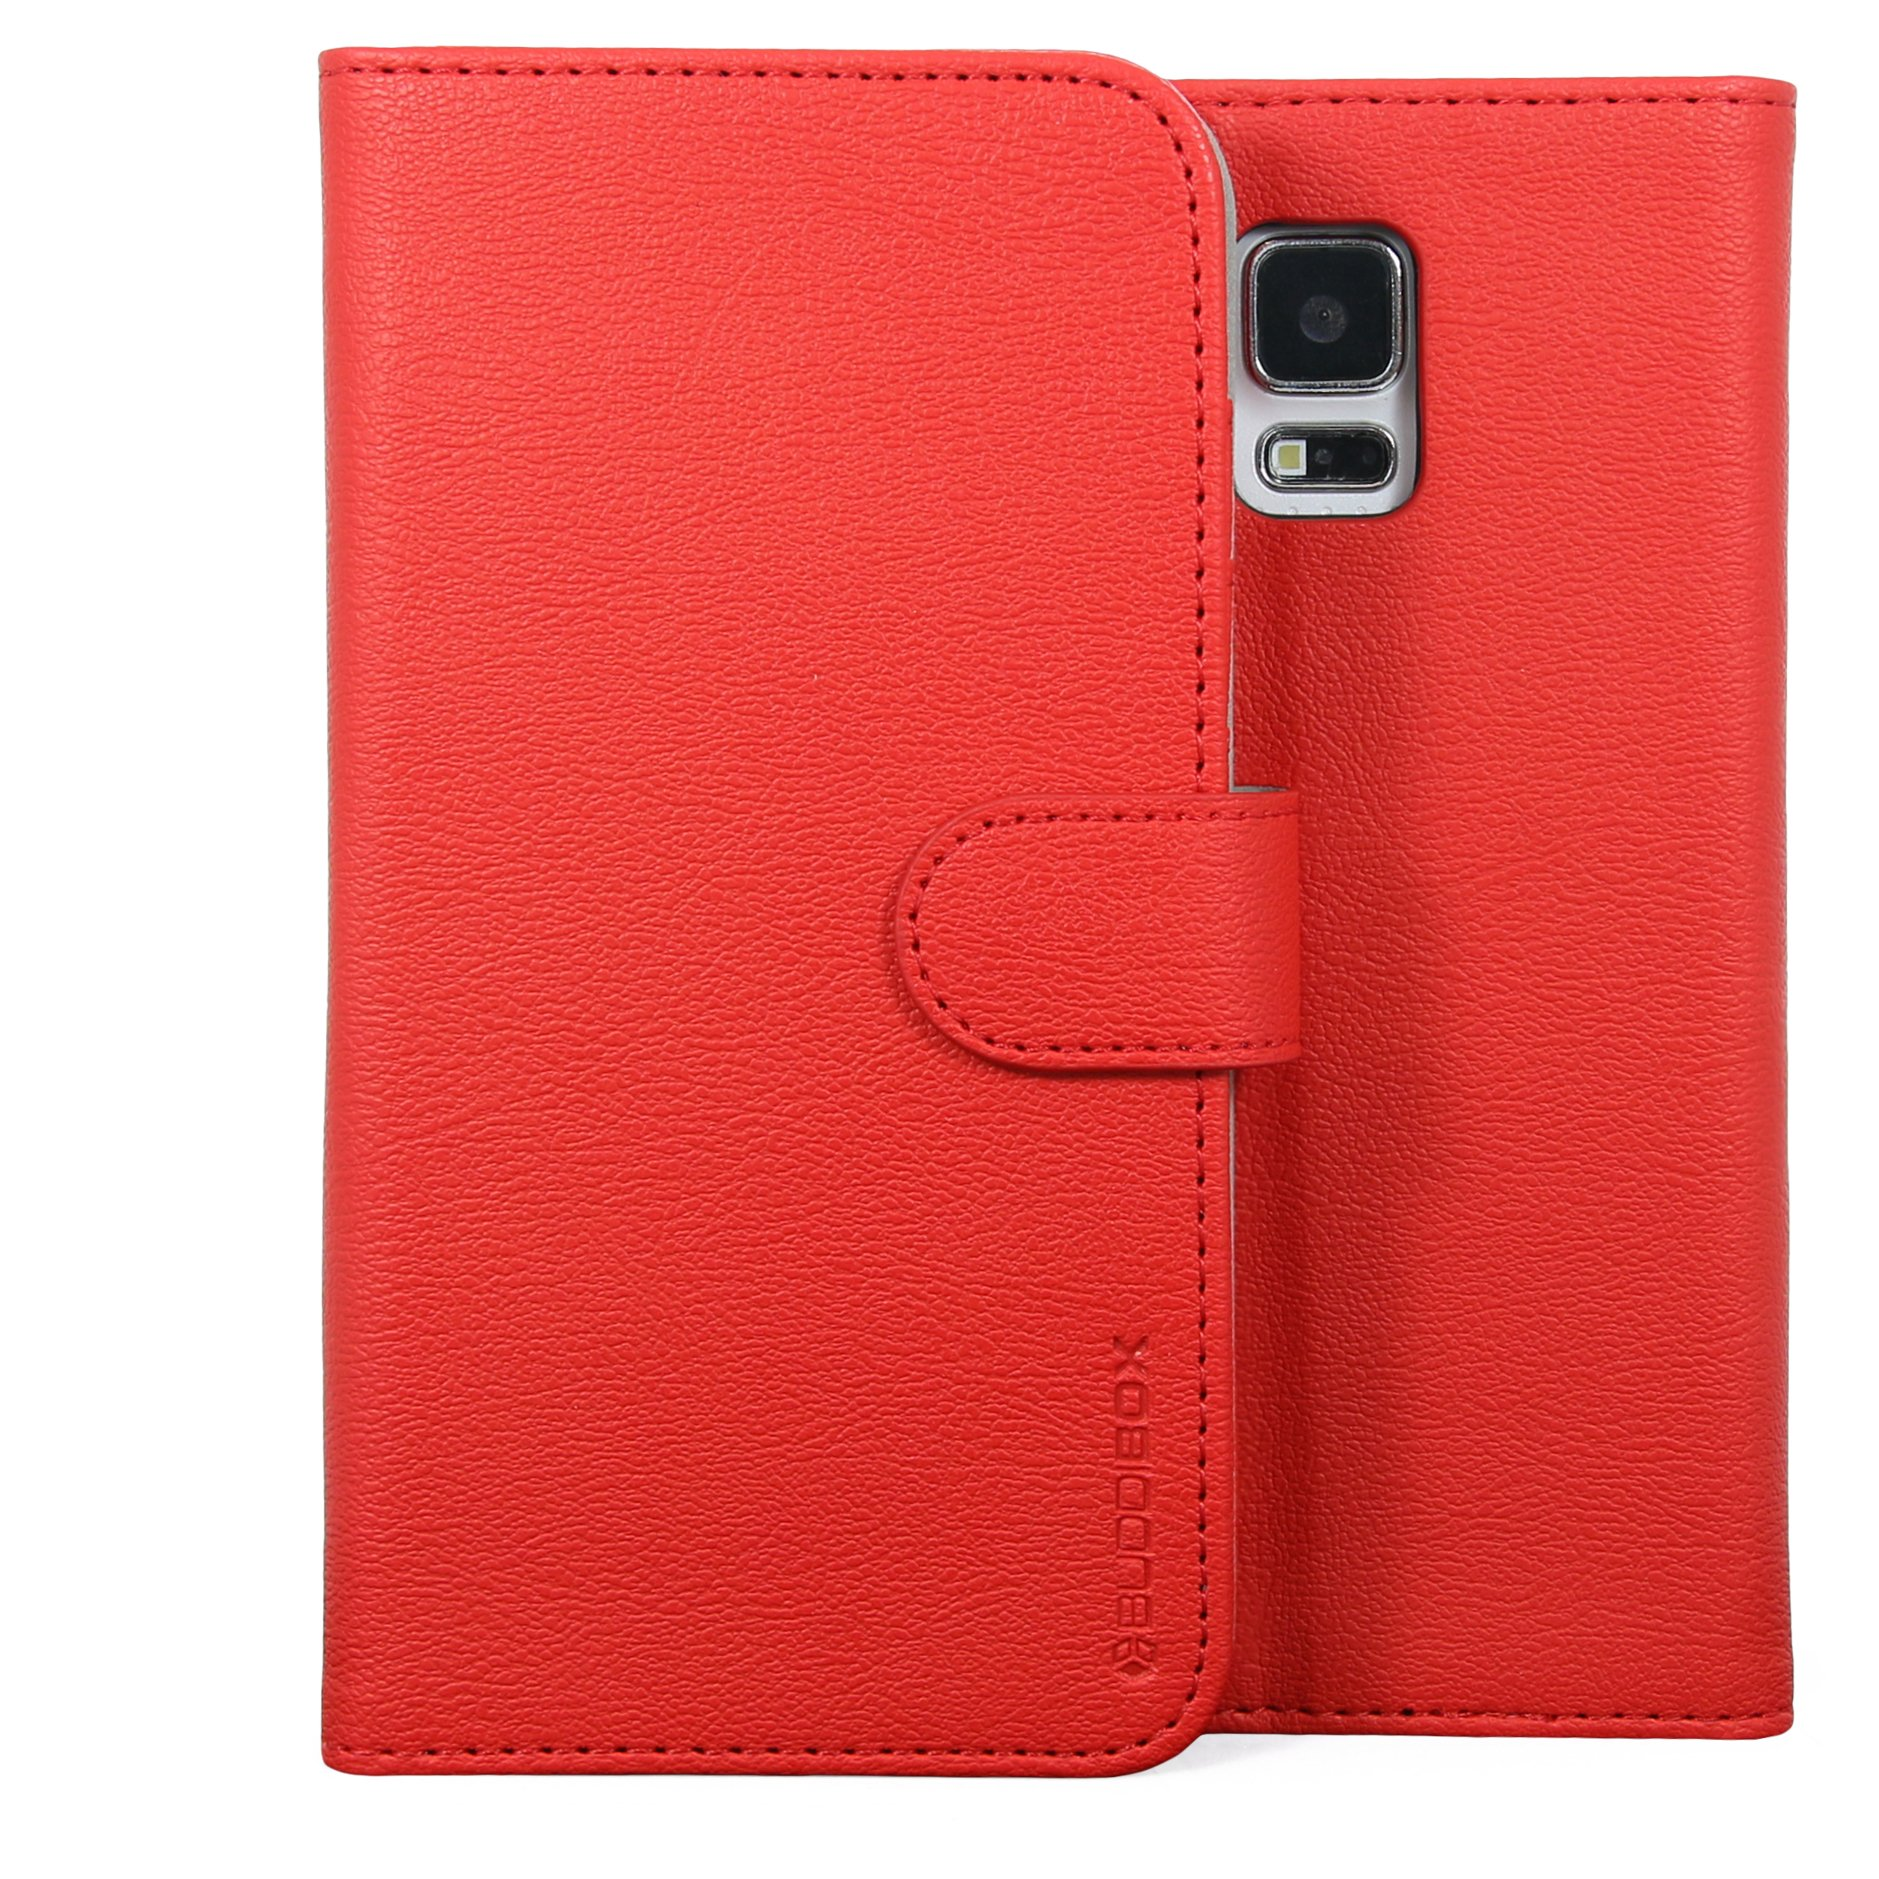 Galaxy S5 Case, BUDDIBOX [Wallet Case] Premium PU